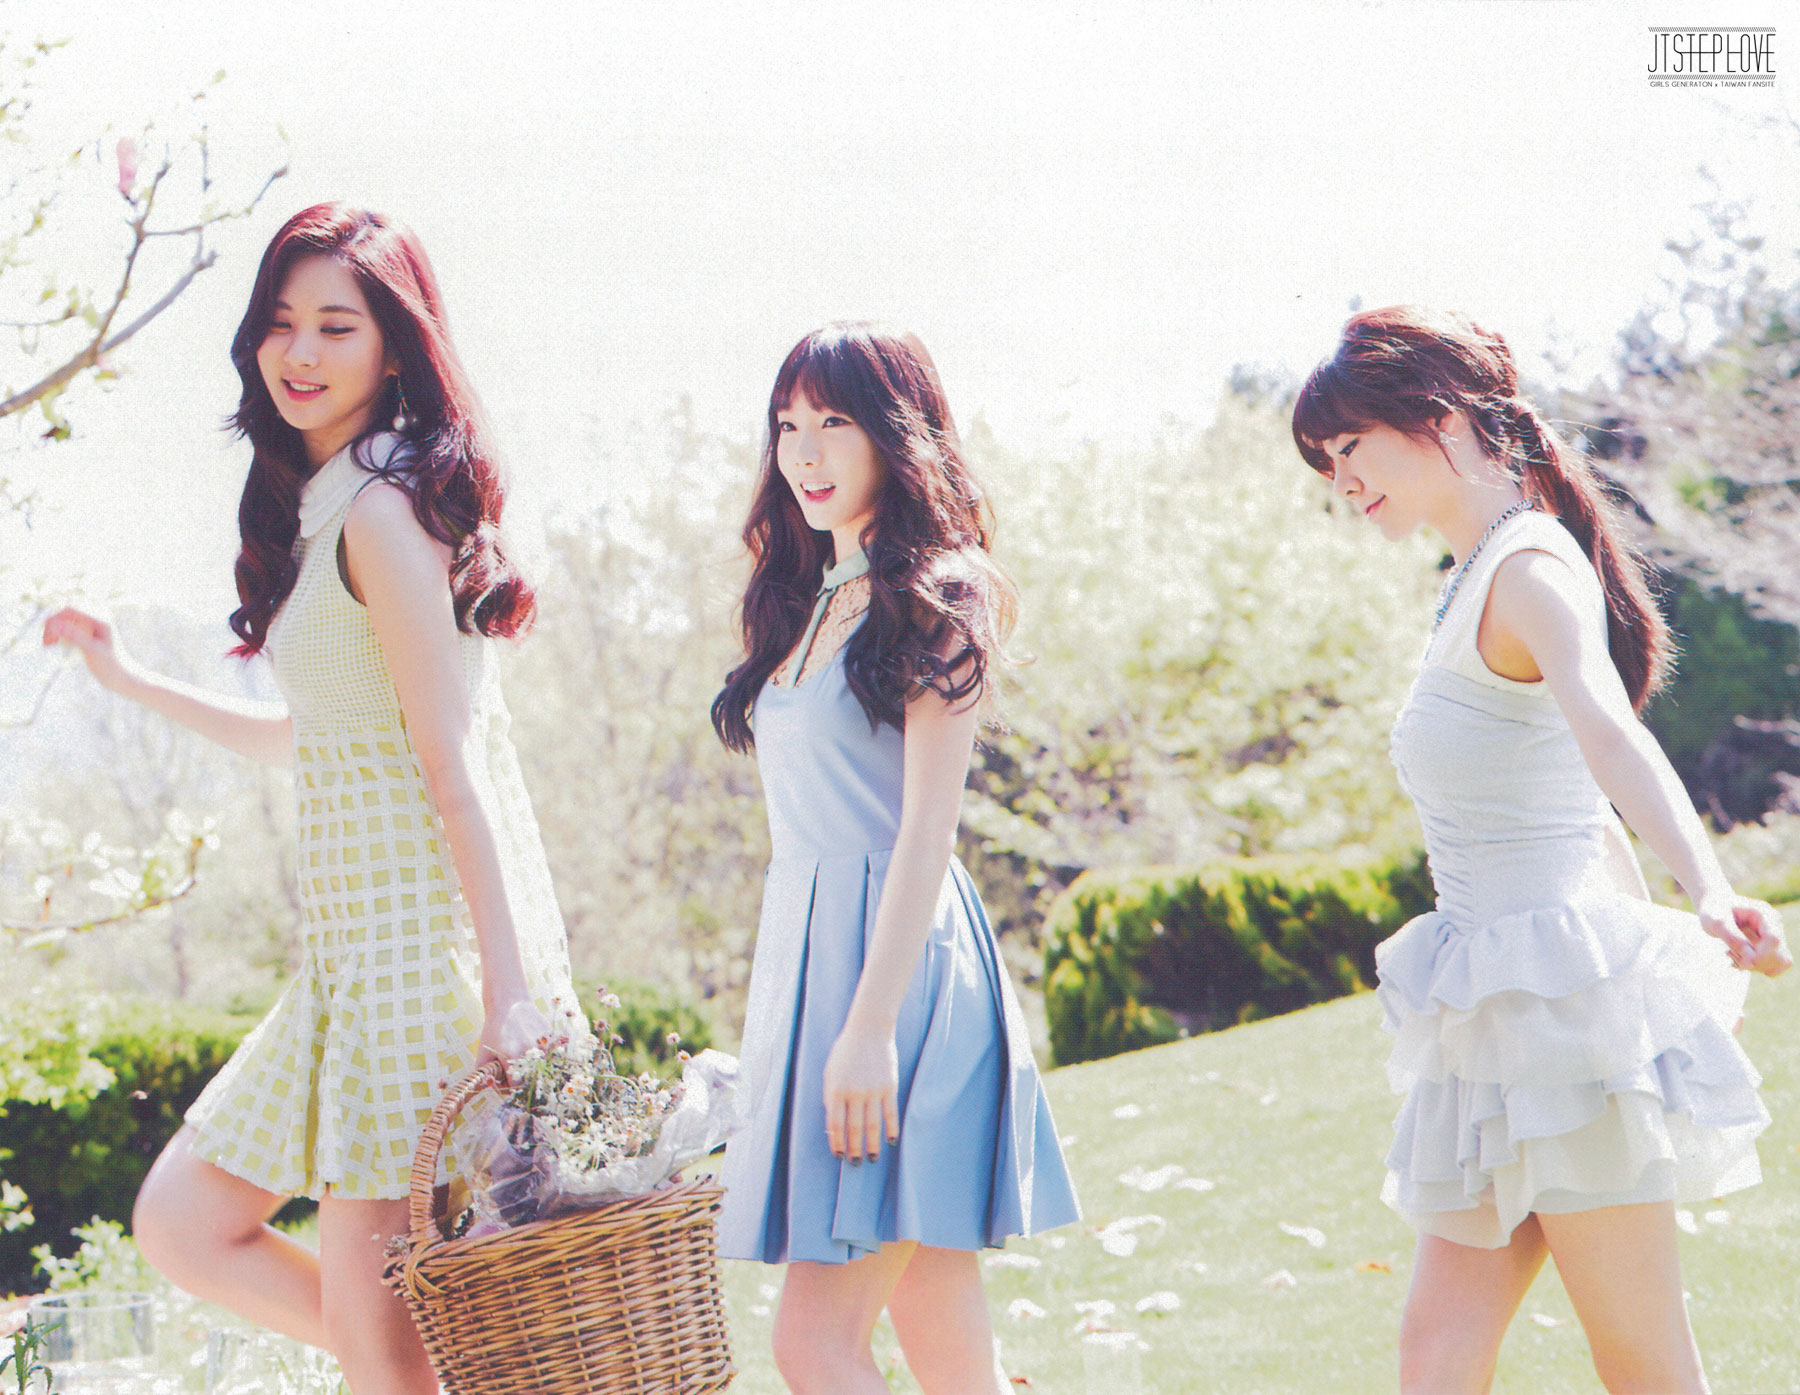 SNSD The Best Japanese Album